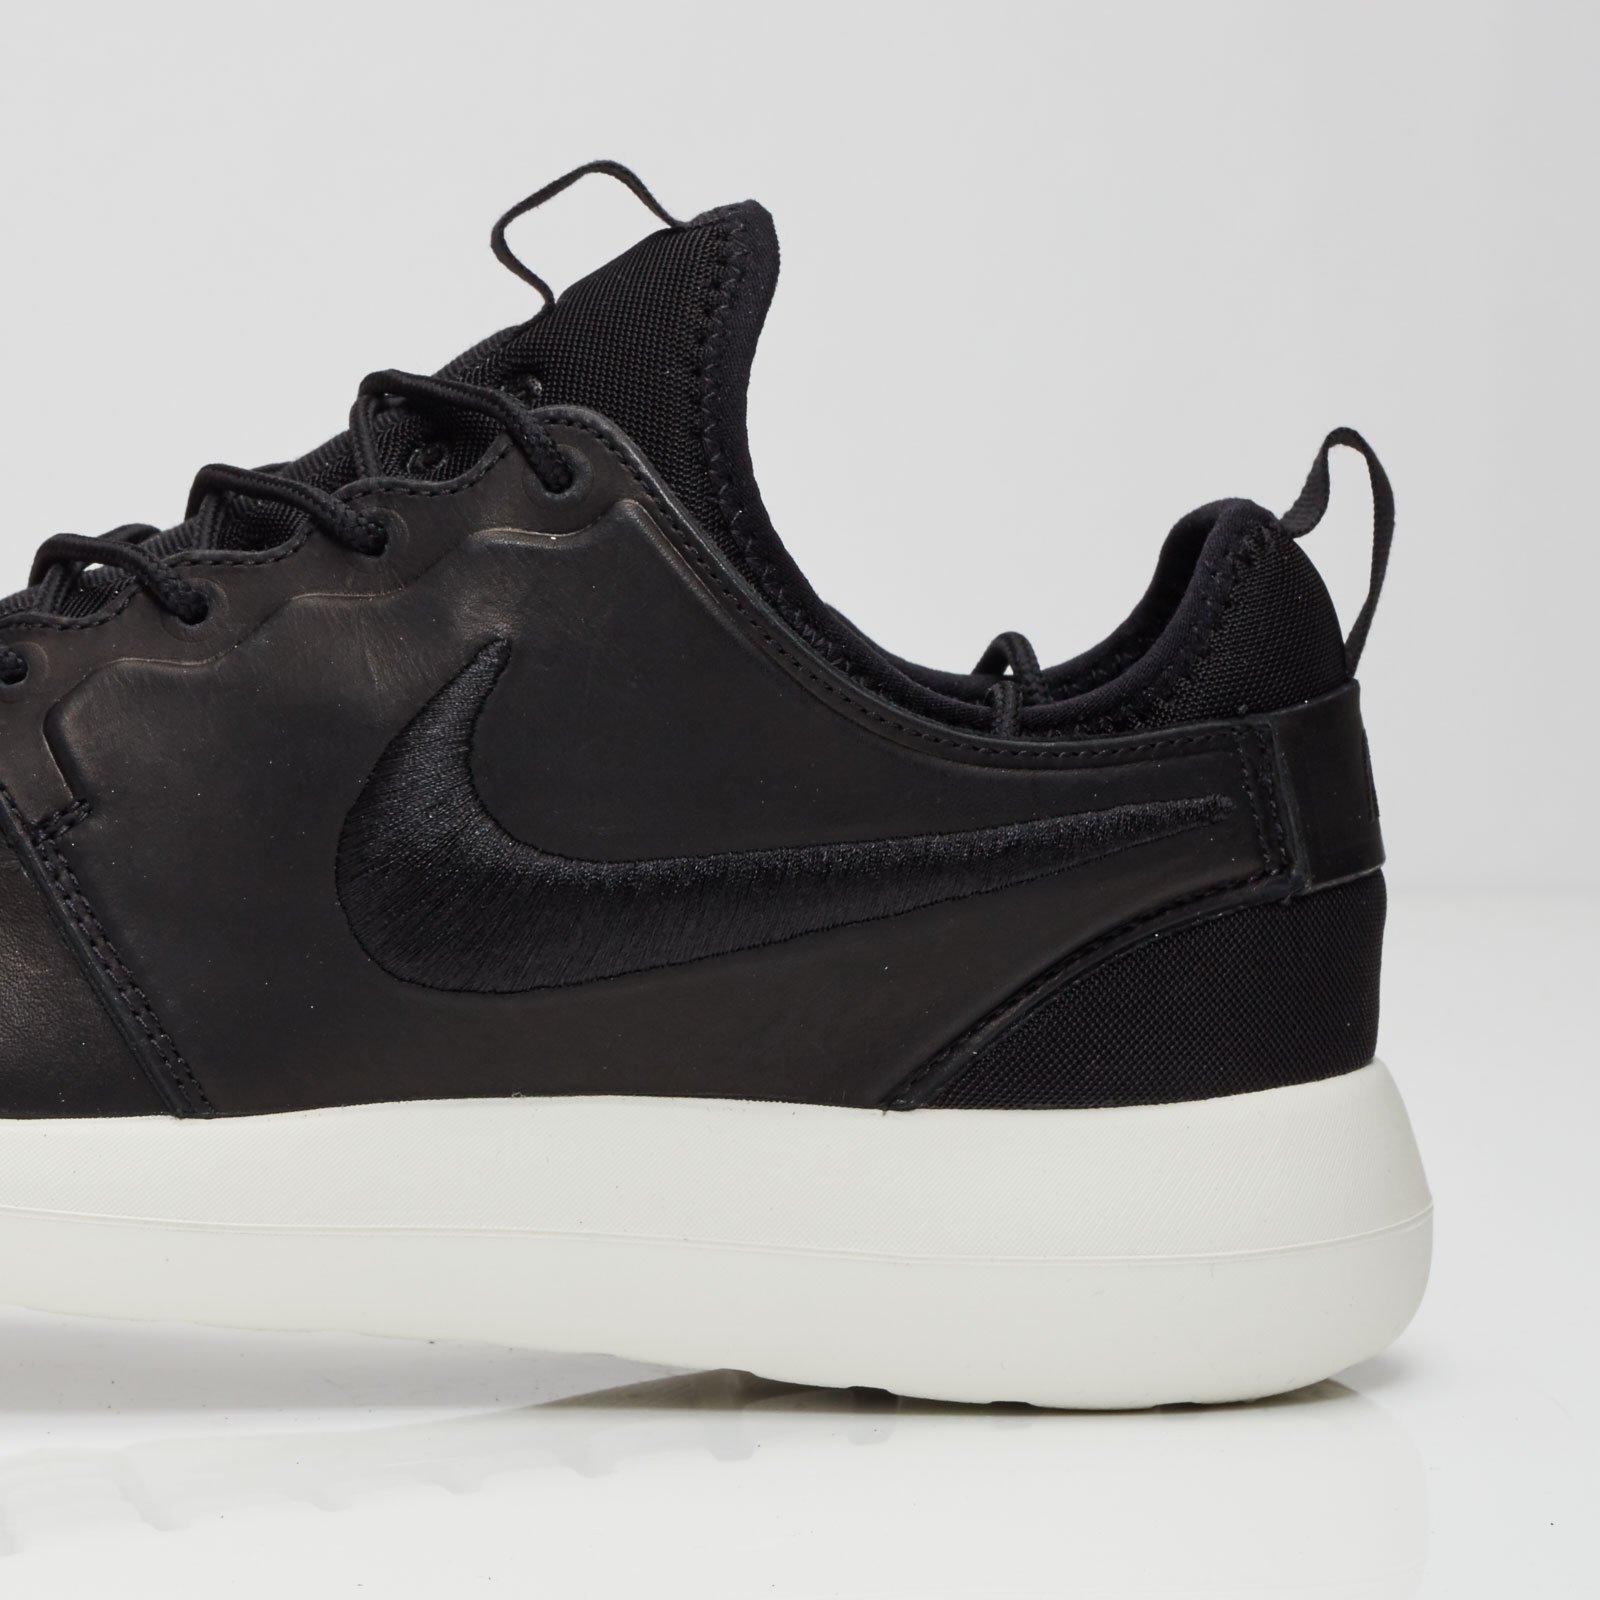 93a90441baee9 Nike Roshe Two Leather Premium - 876521-001 - Sneakersnstuff ...